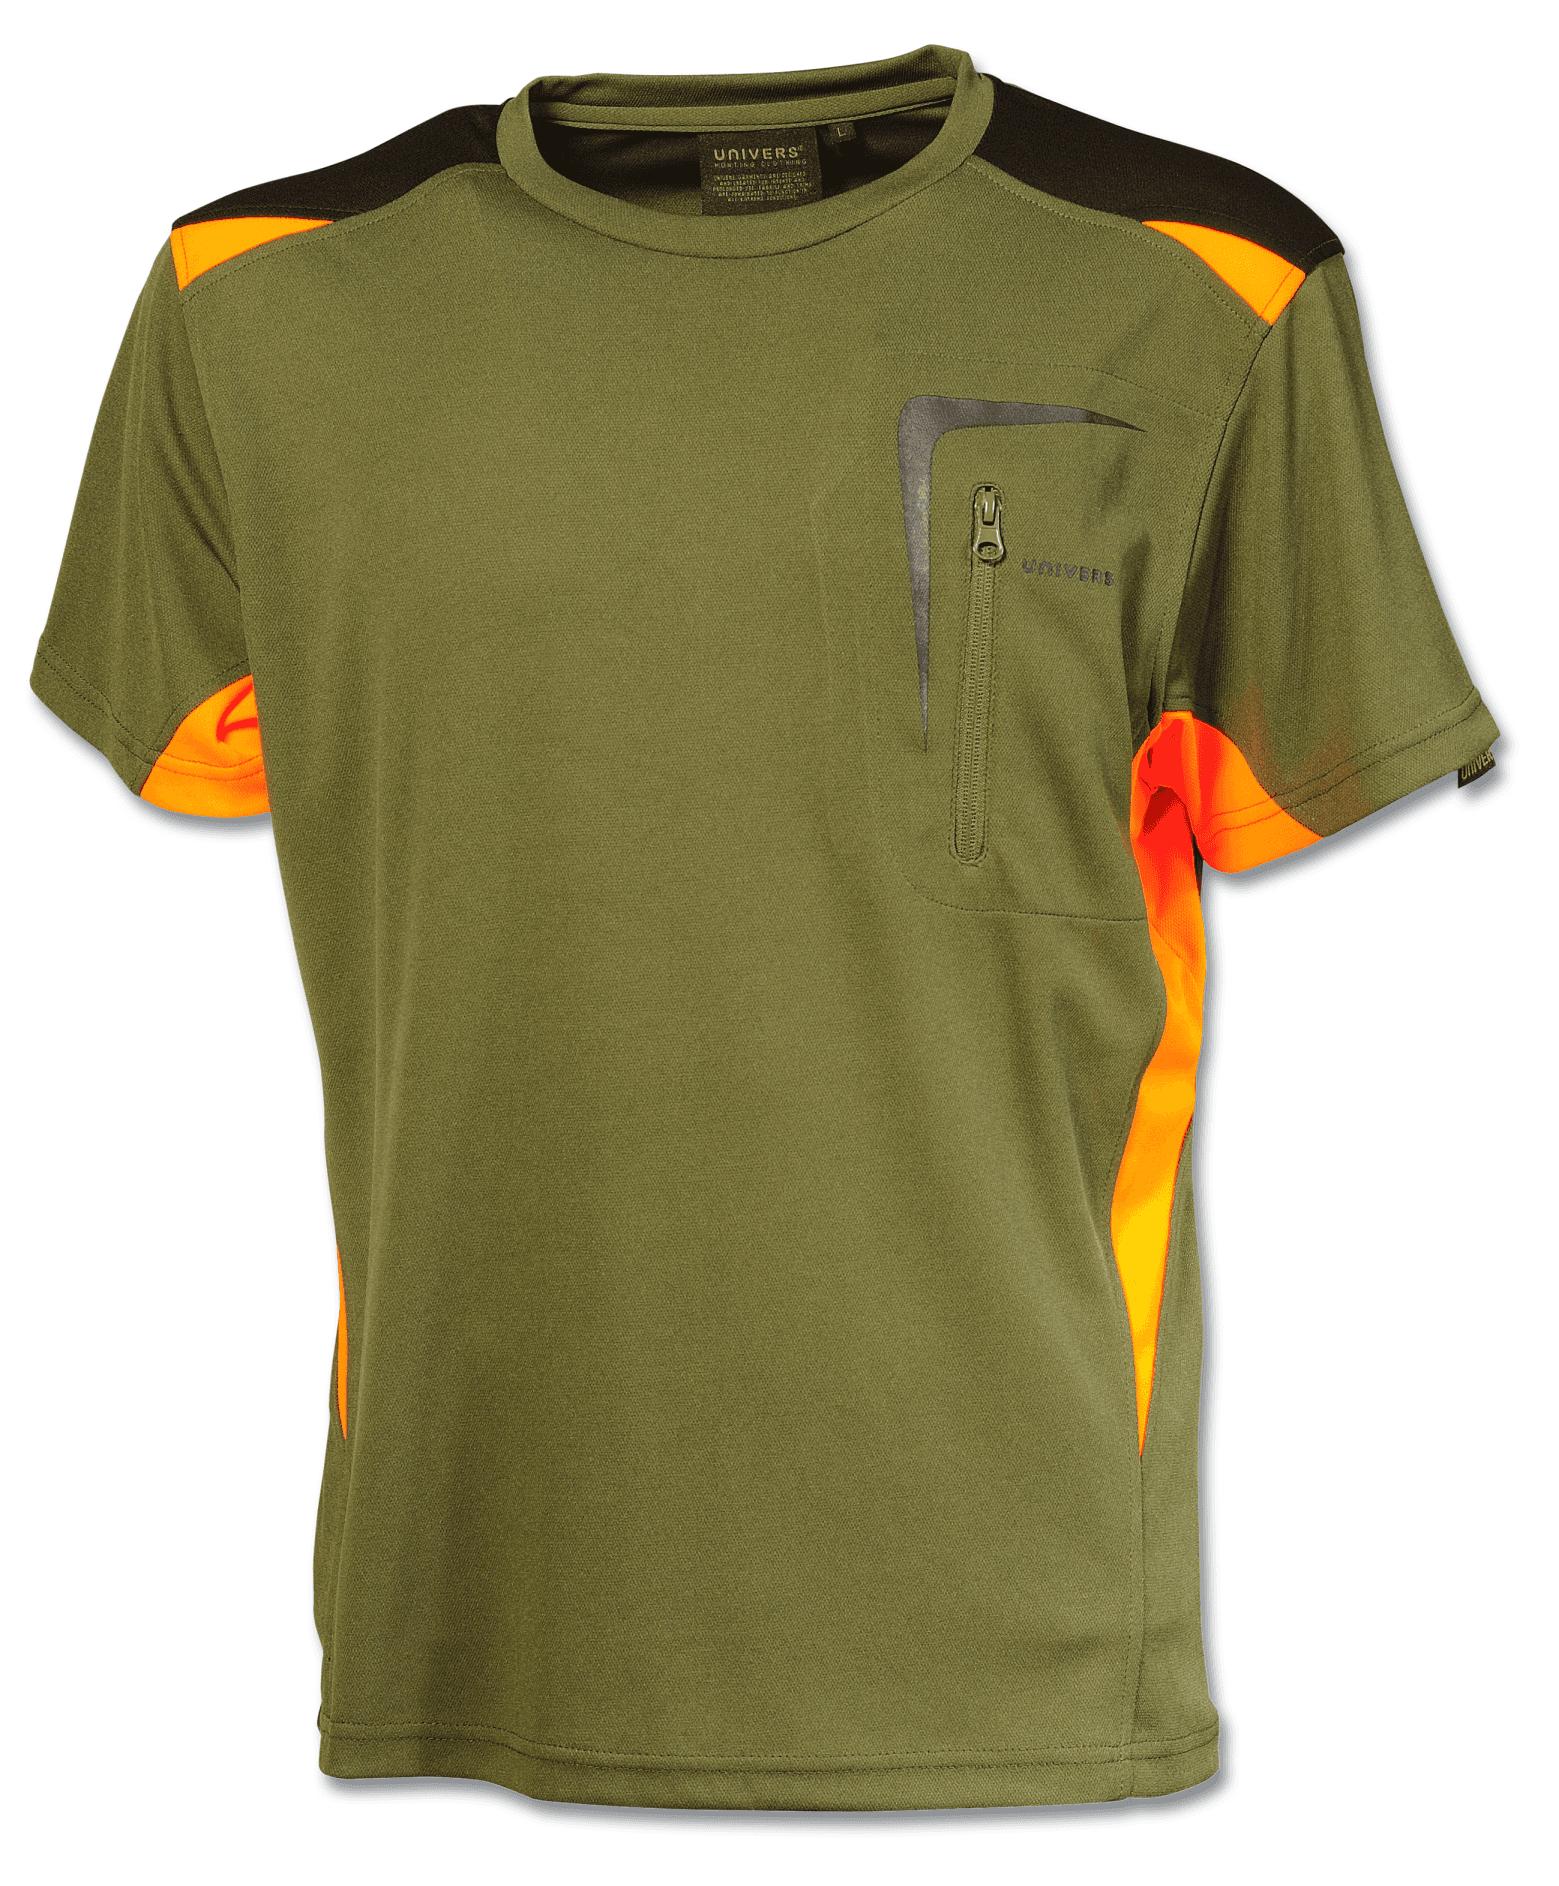 Univers Technical T-shirt S/S 94107 / 392